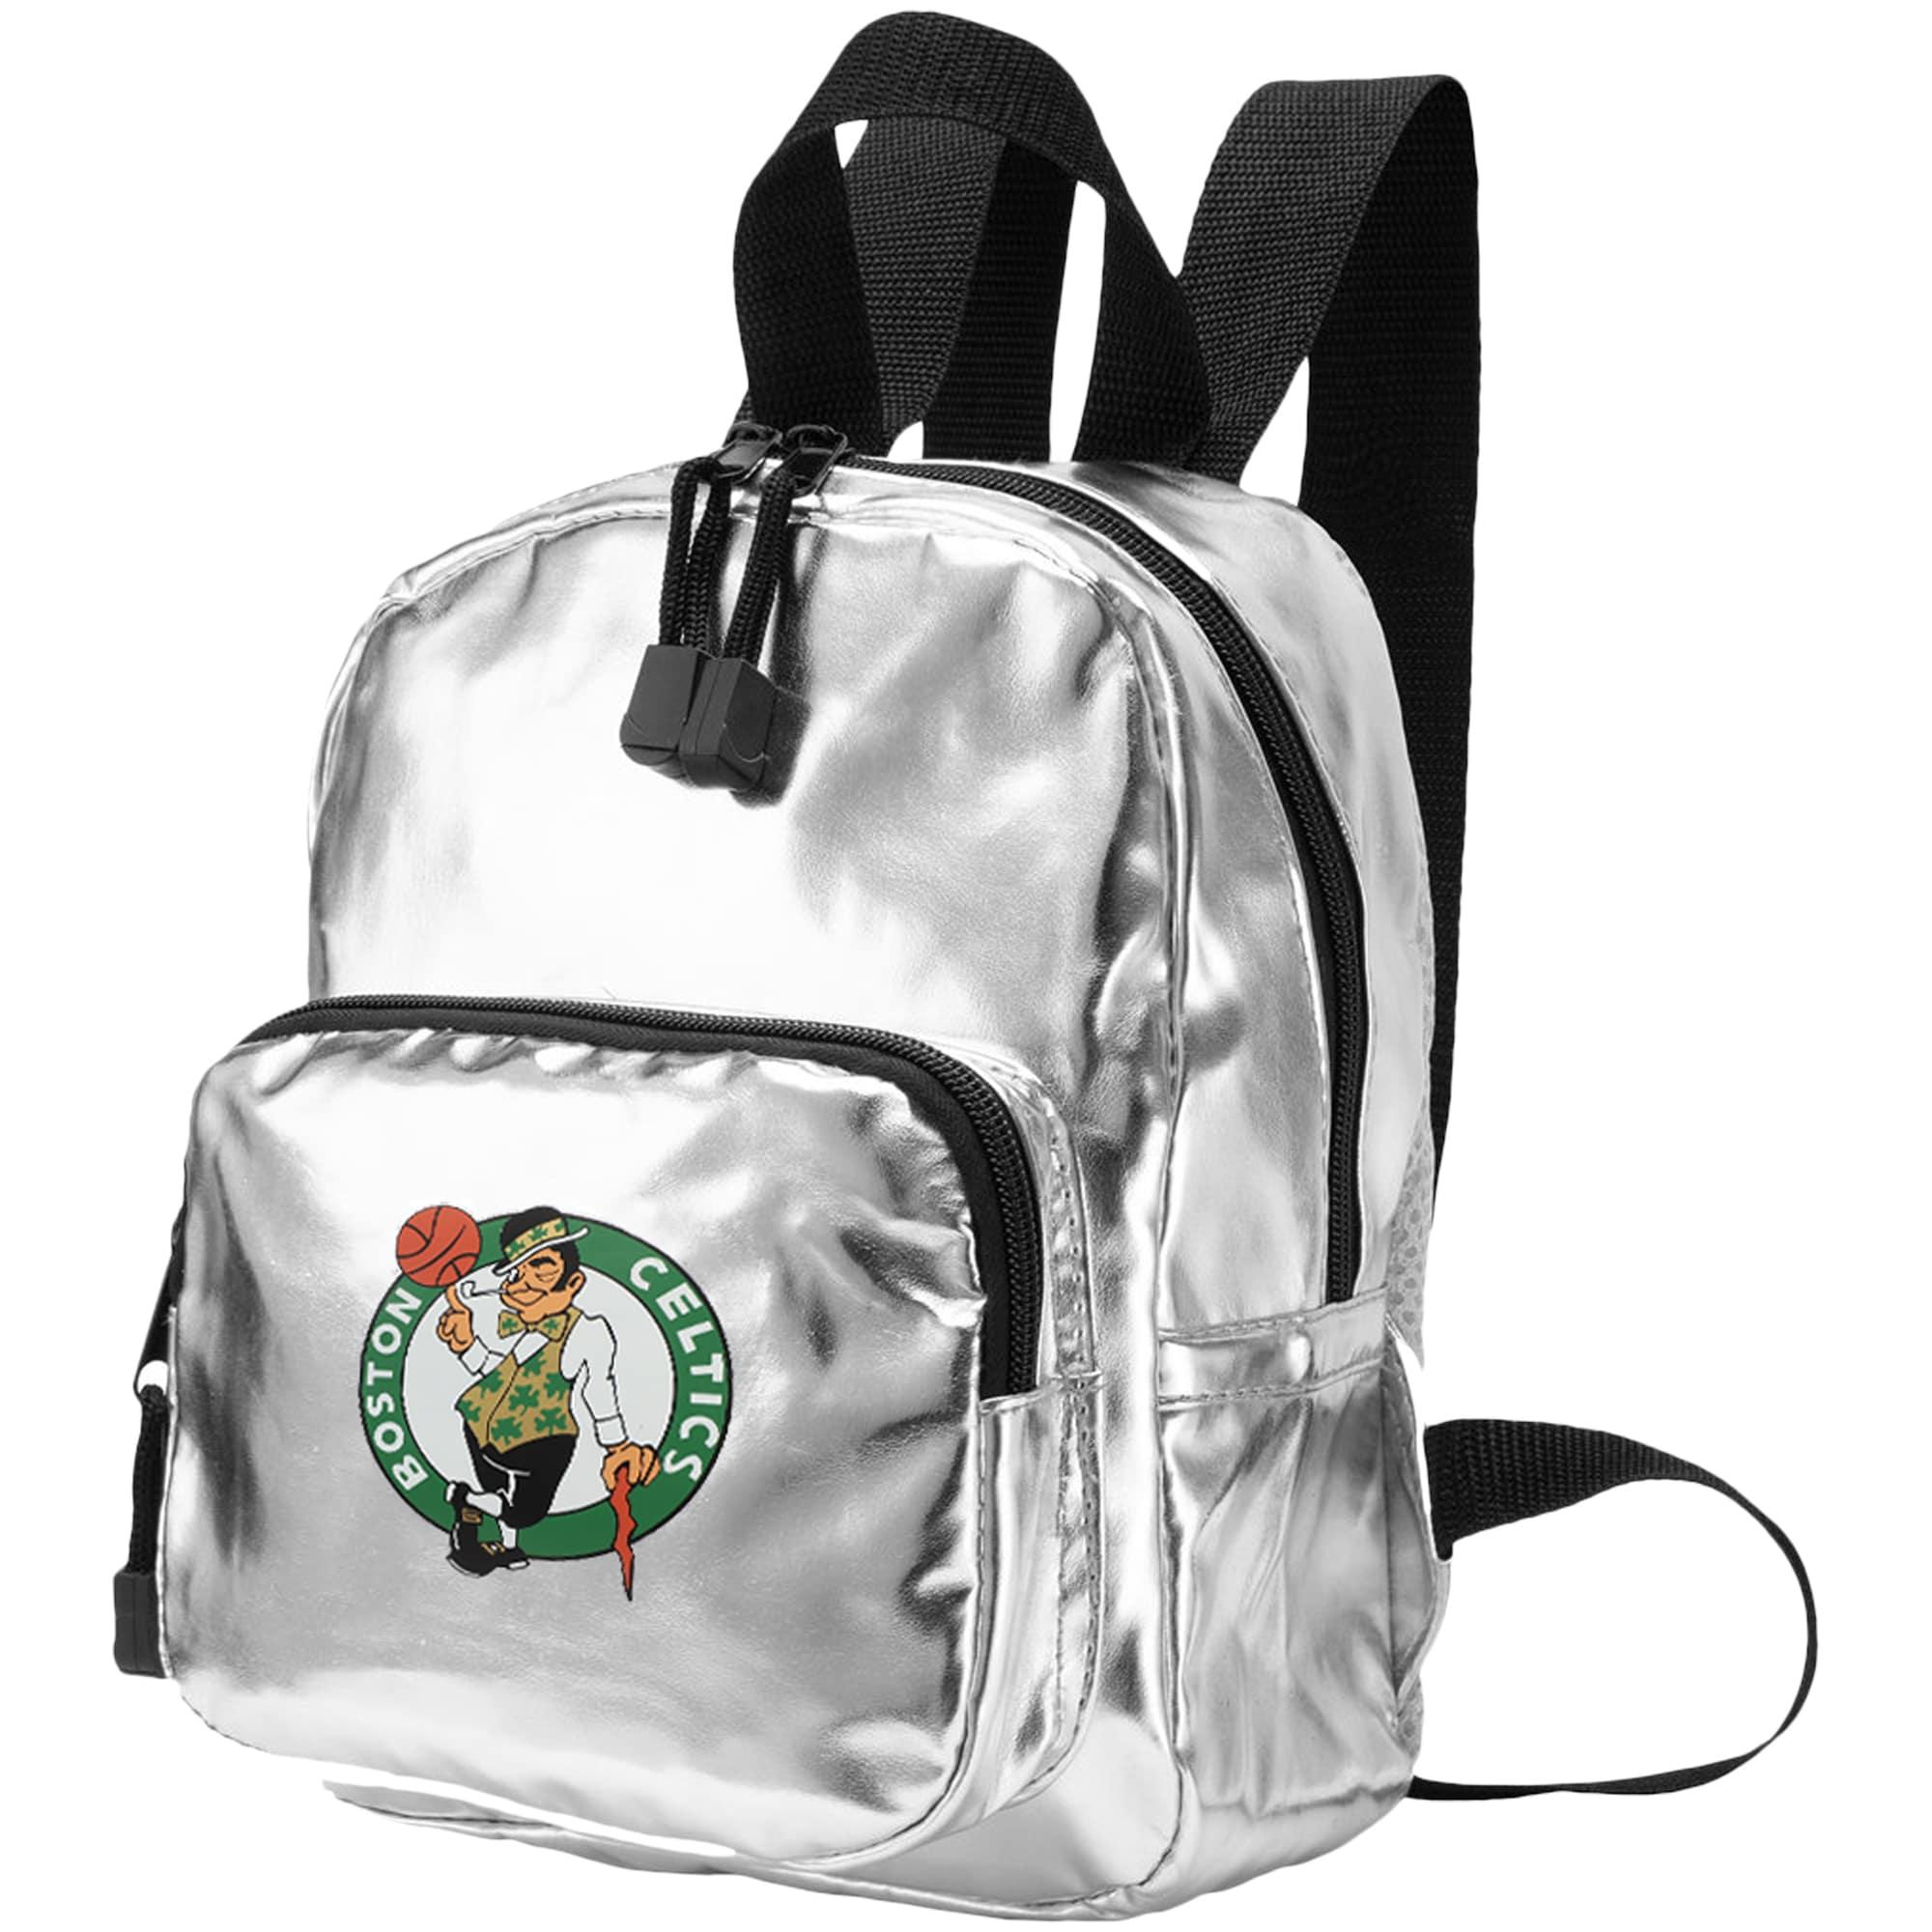 Boston Celtics The Northwest Company Spotlight Mini Backpack